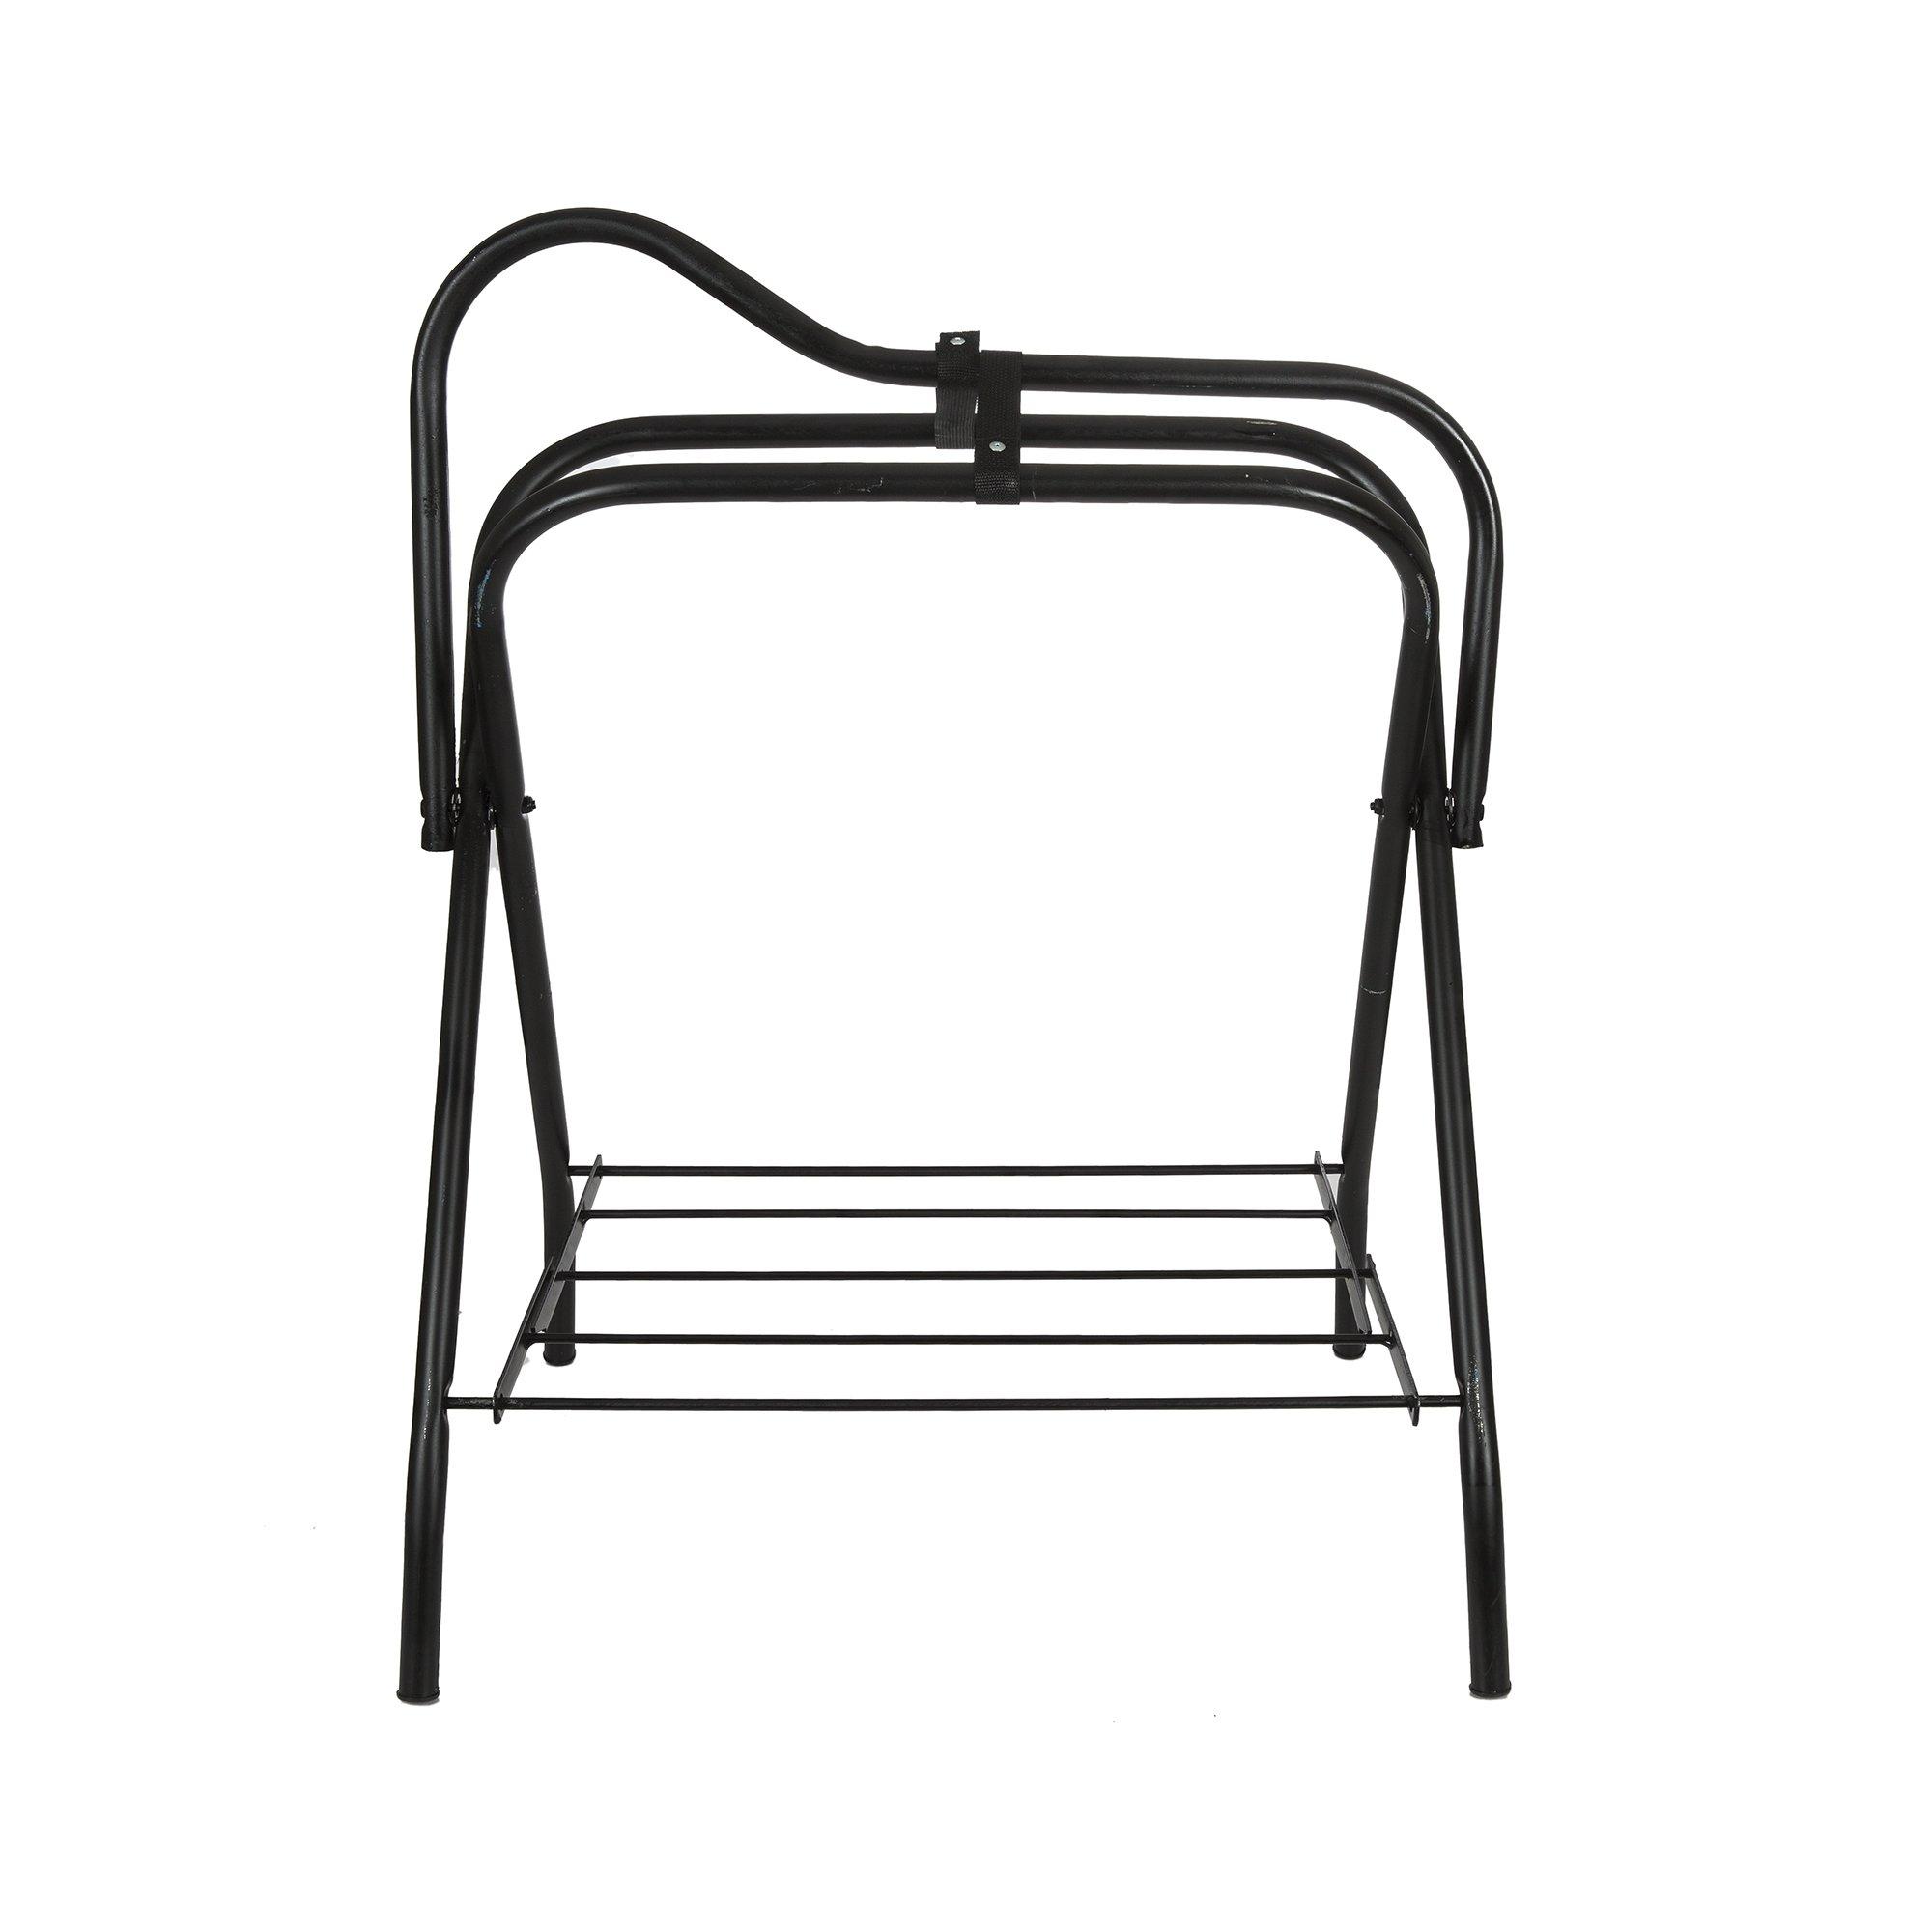 Intrepid International Folding Saddle Stand, Black by Intrepid International